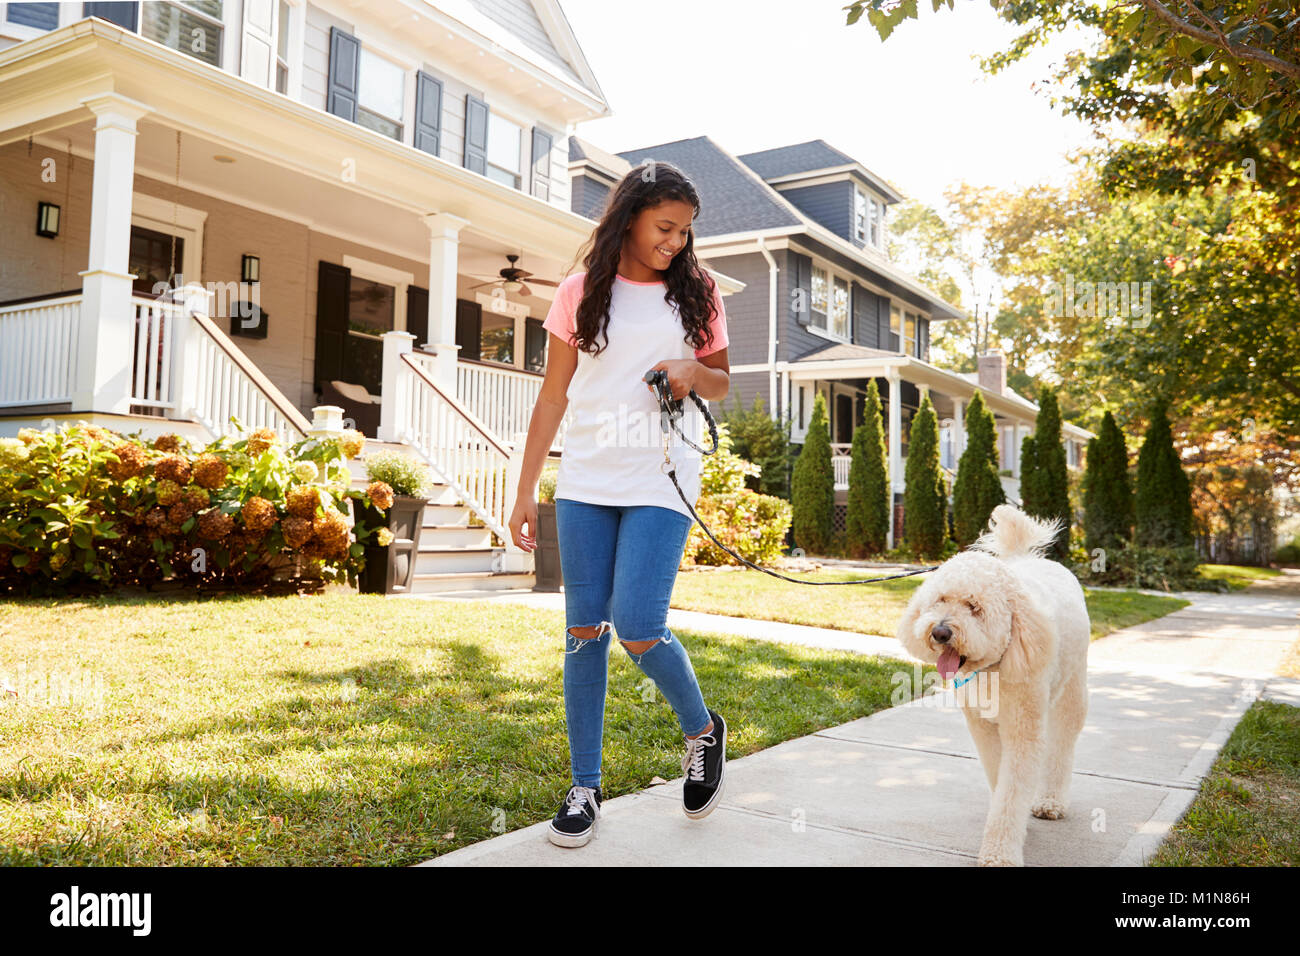 Girl Walking Dog Along Suburban Street - Stock Image